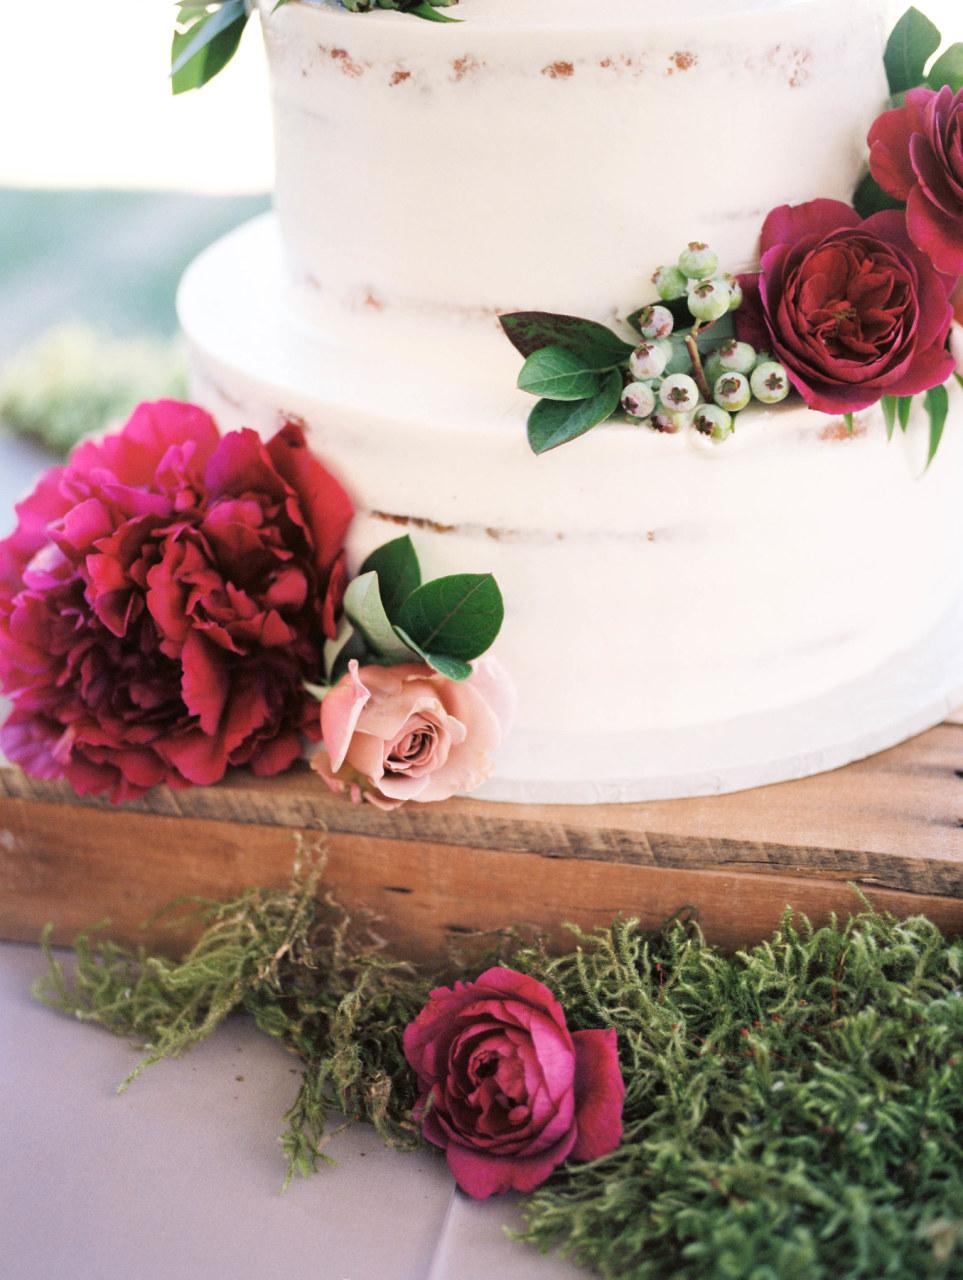 fine-art-wedding-florist-foraged-floral-lewis-and-clark-college-wedding-peony-on-wedding-cake.jpg